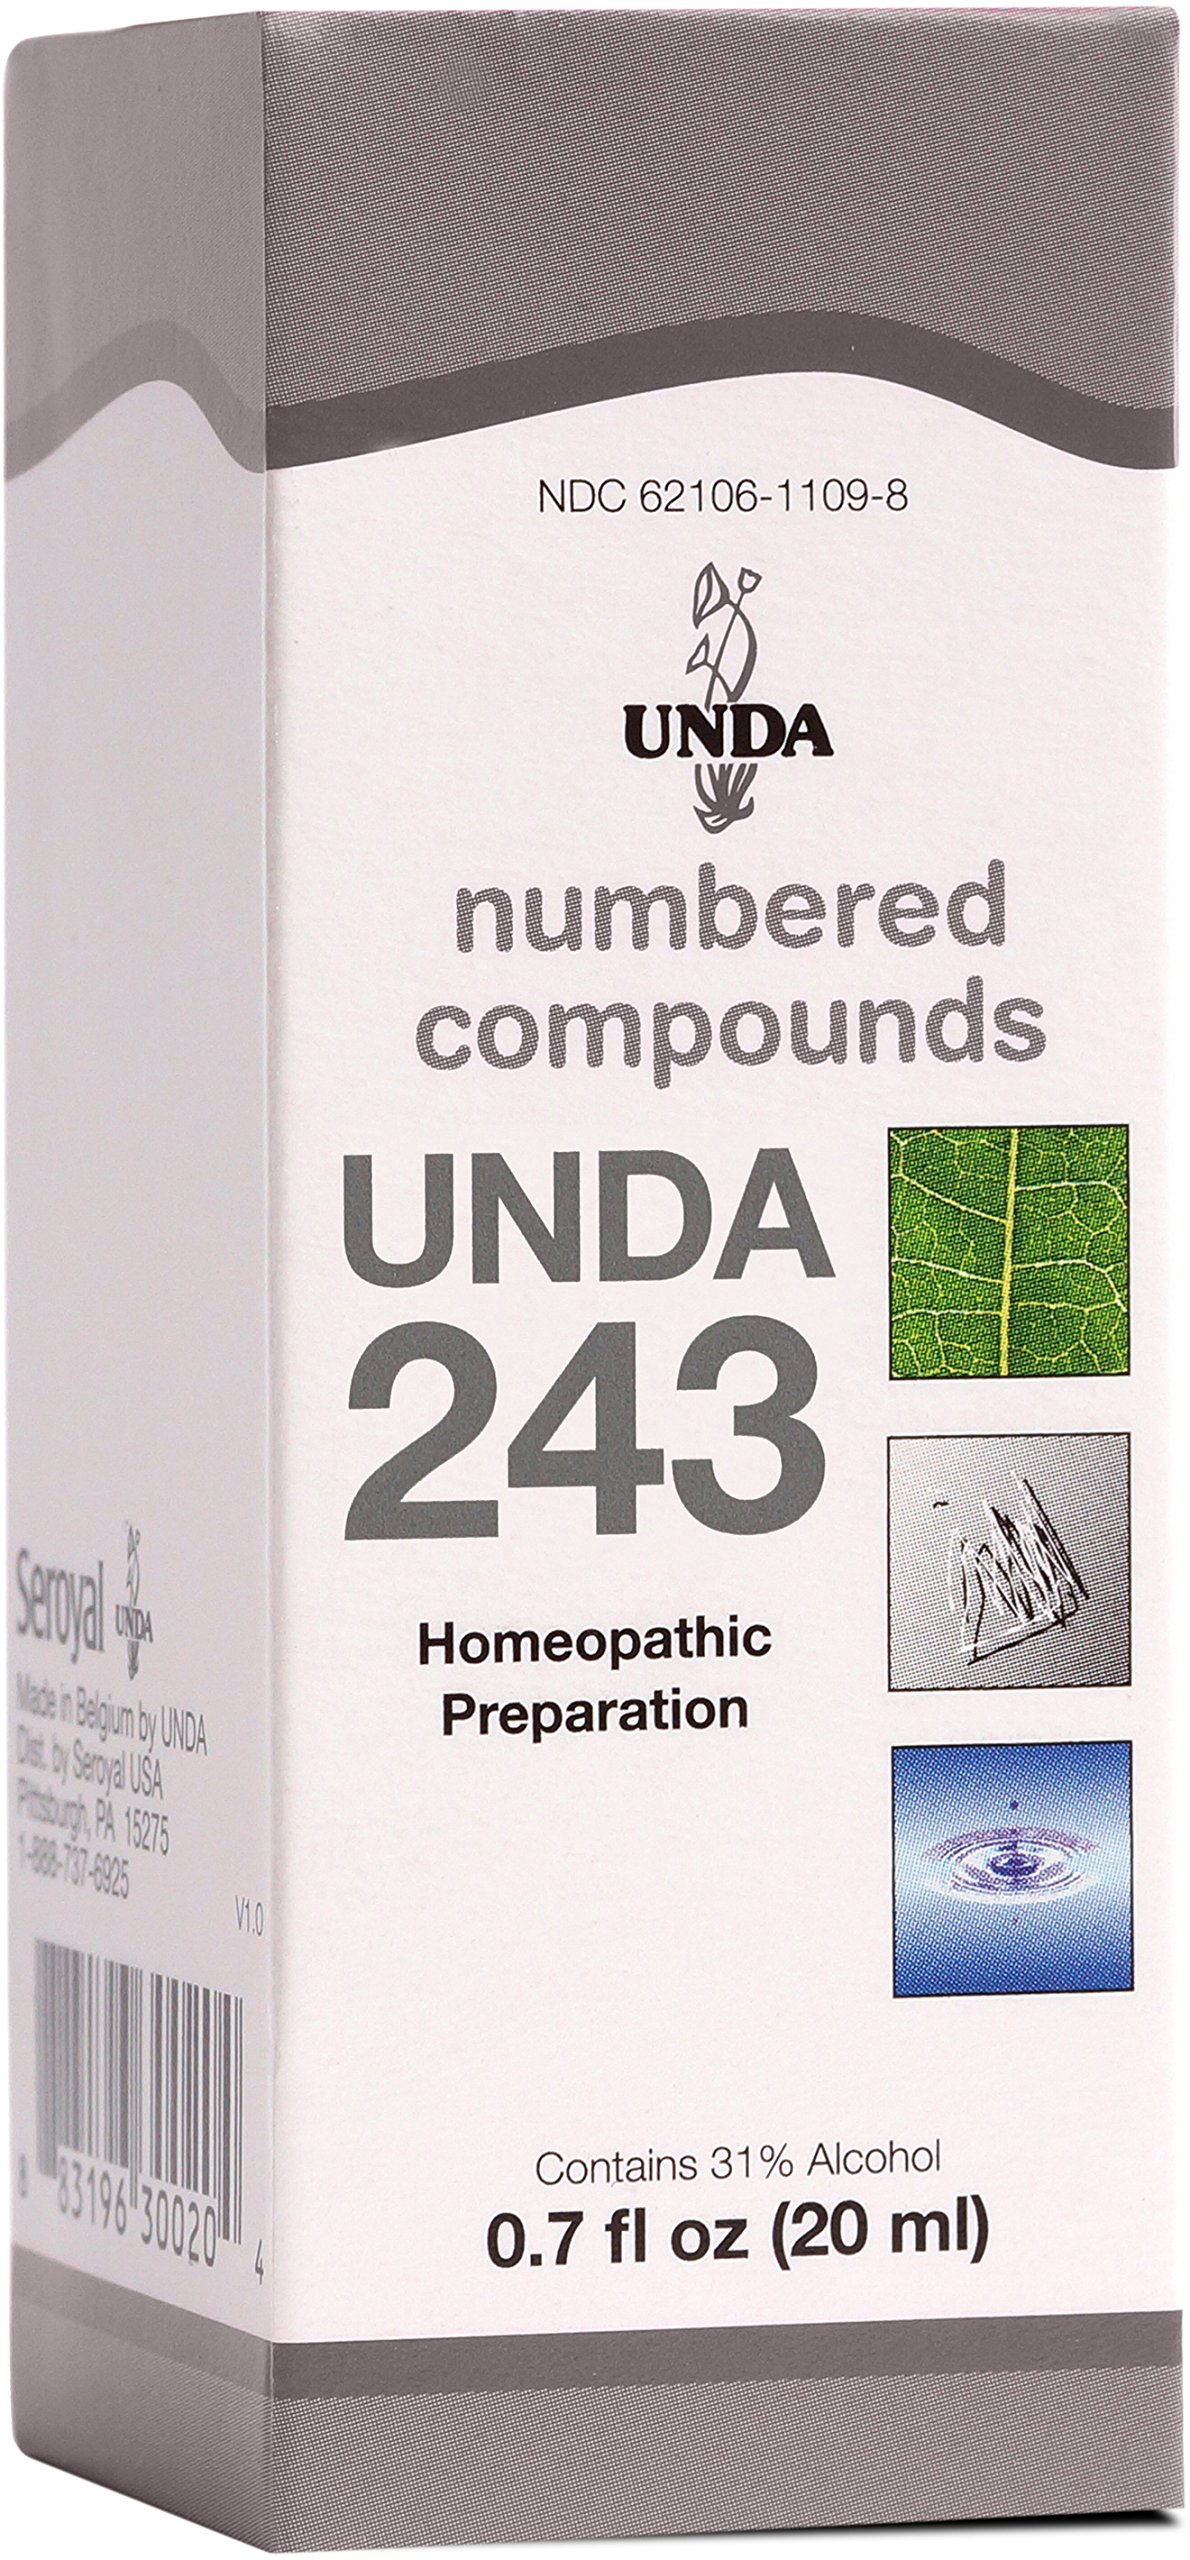 UNDA - UNDA 243 Numbered Compounds - Homeopathic Preparation - 0.7 fl oz (20 ml) by UNDA